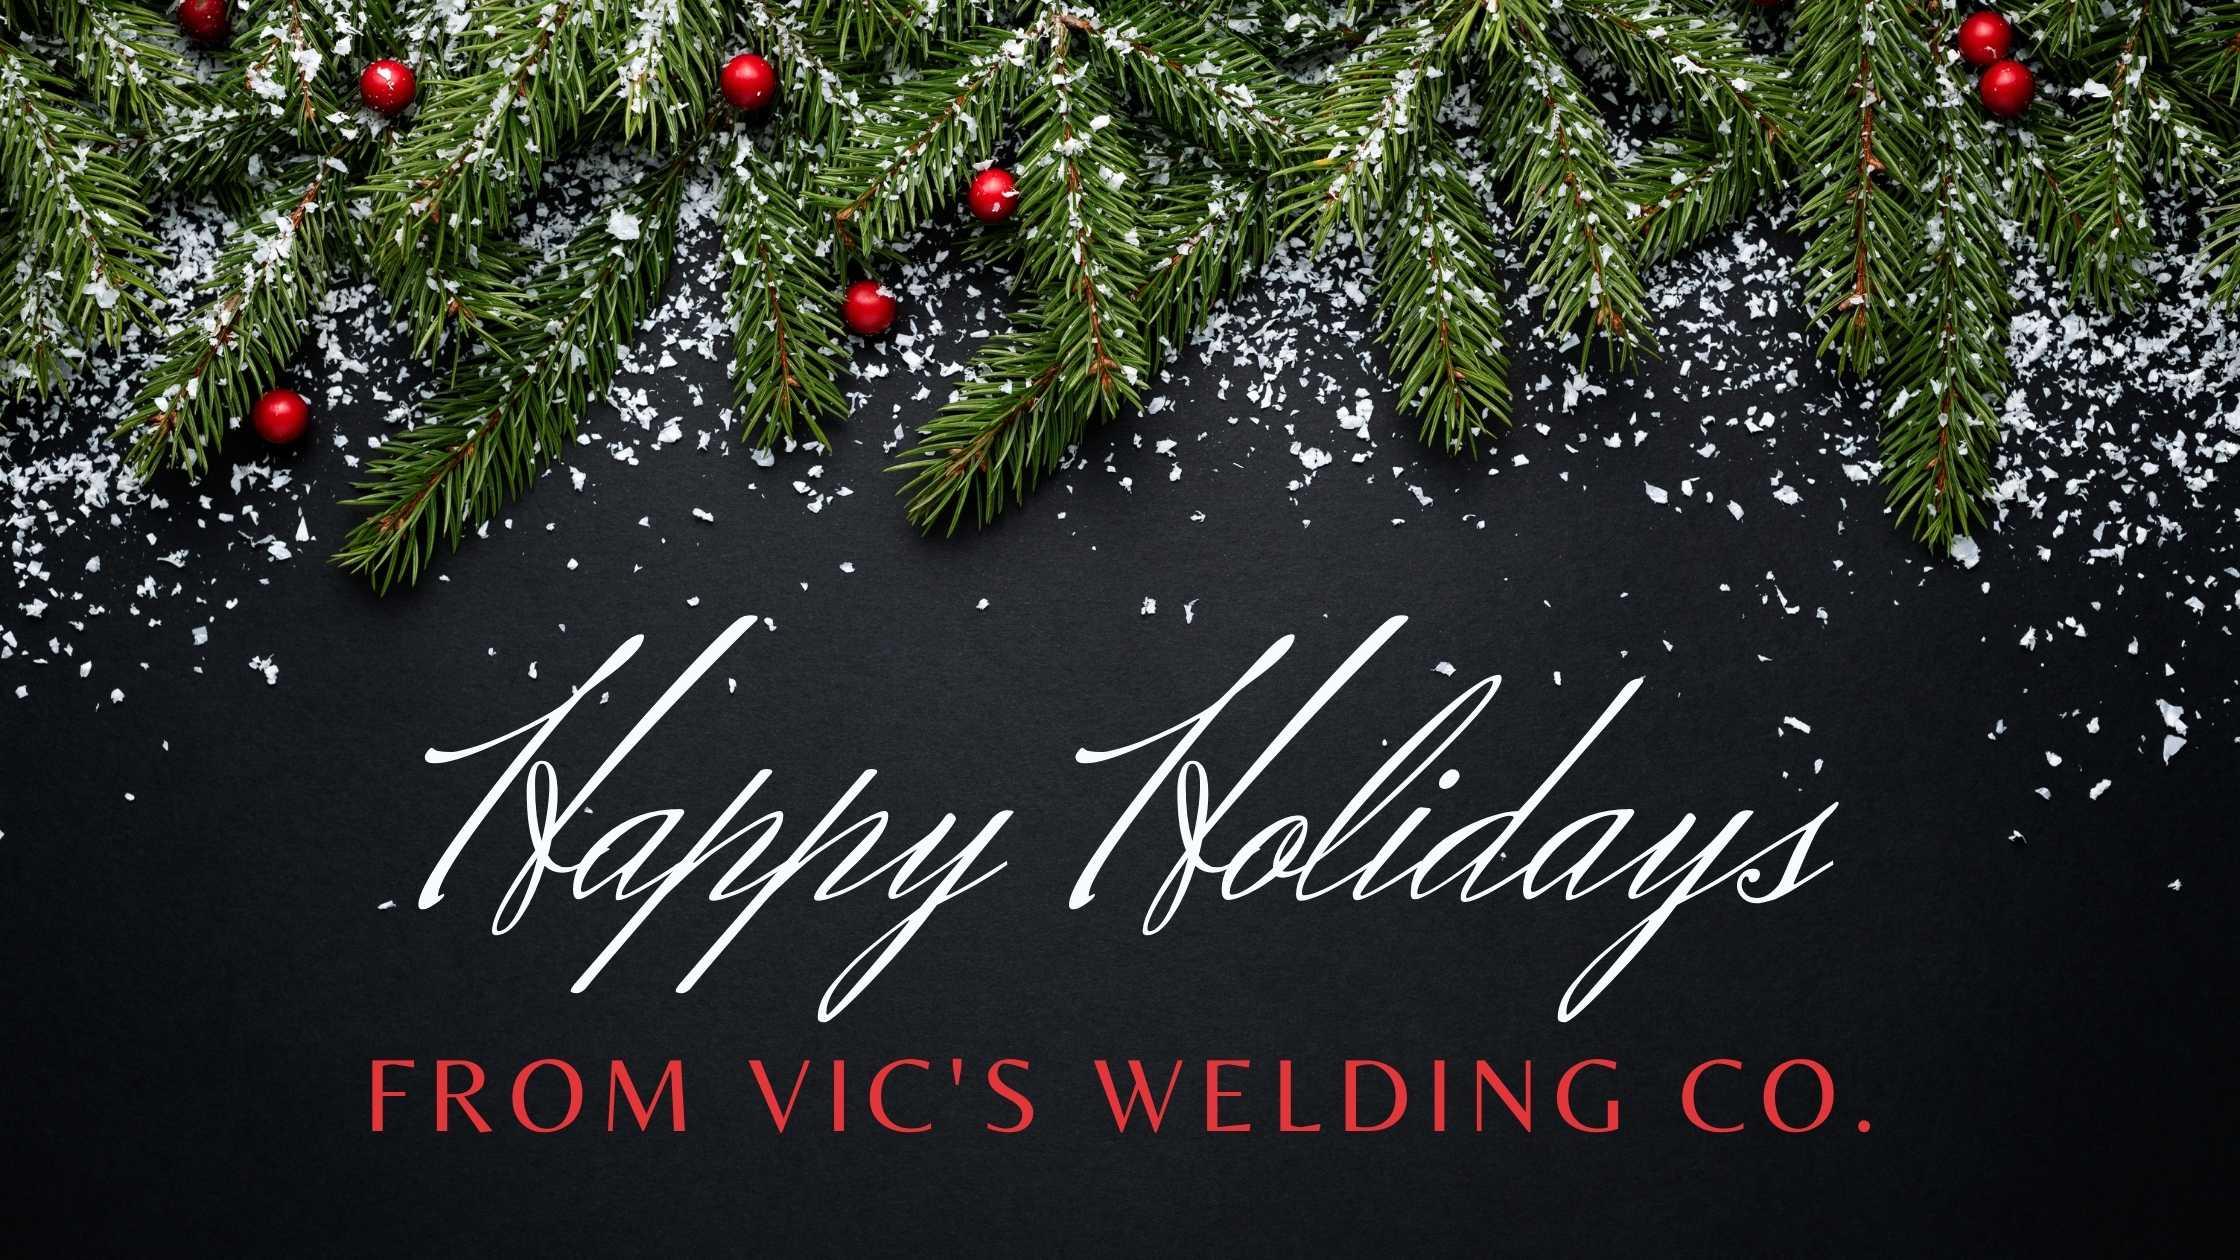 Vic's Welding CO